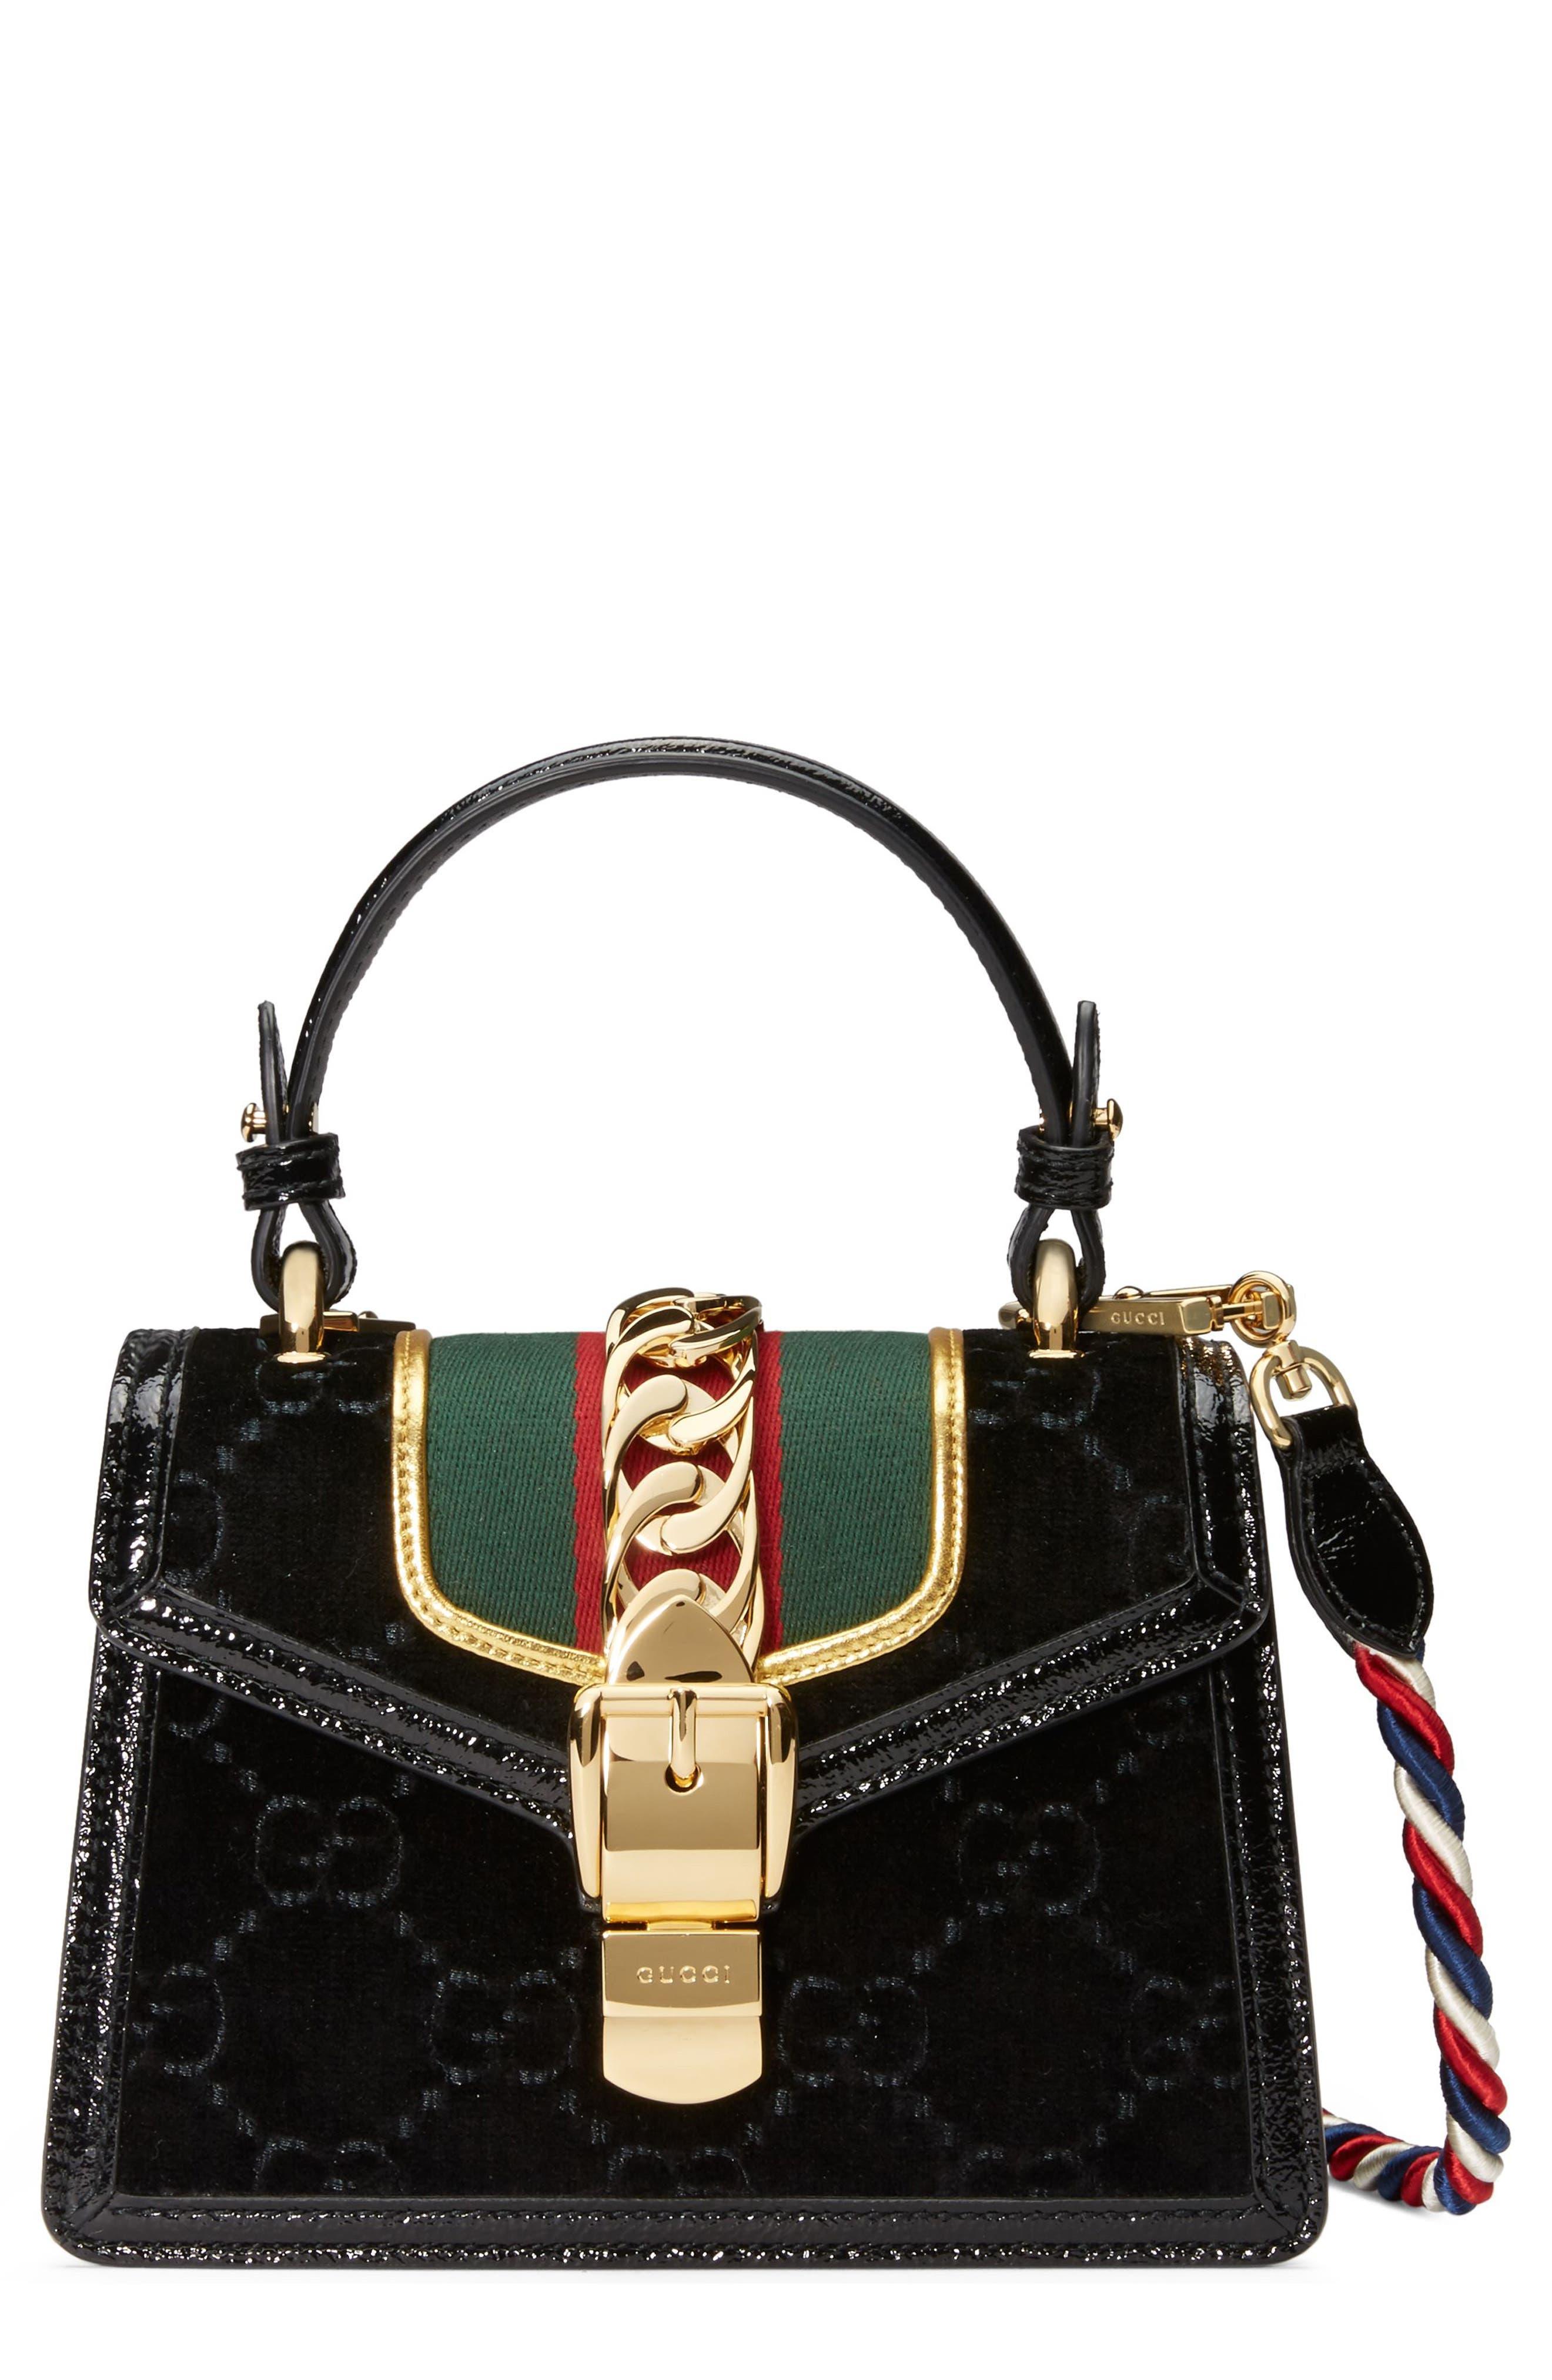 Mini Sylvie Velvet Top Handle Bag,                             Main thumbnail 1, color,                             Nero/ Vert Red/ Mystic White